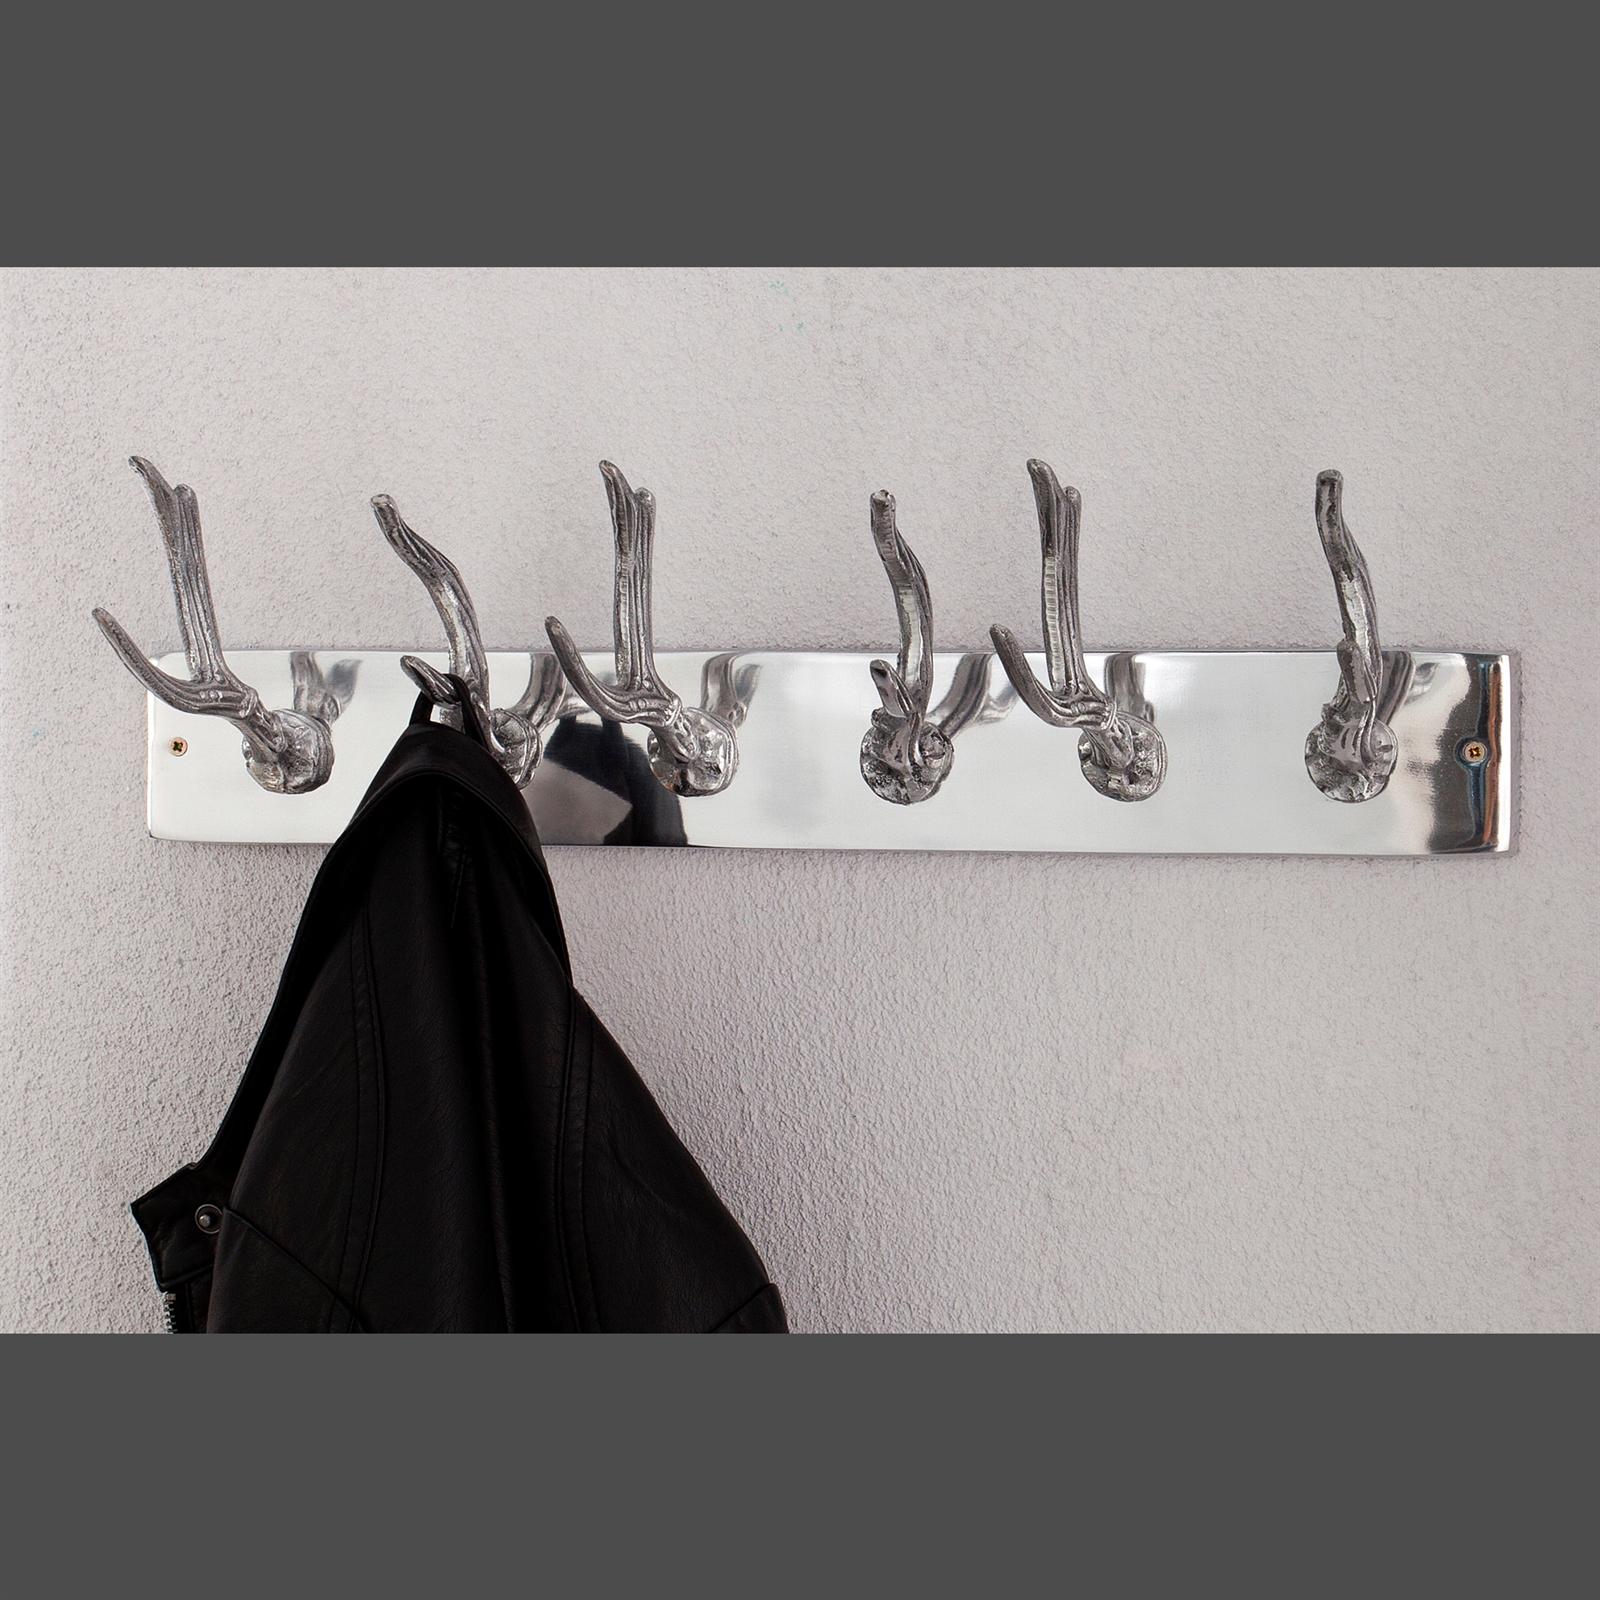 originelle wandgarderobe antler garderobe mit 6 geweih haken silber eur 29 95 picclick de. Black Bedroom Furniture Sets. Home Design Ideas